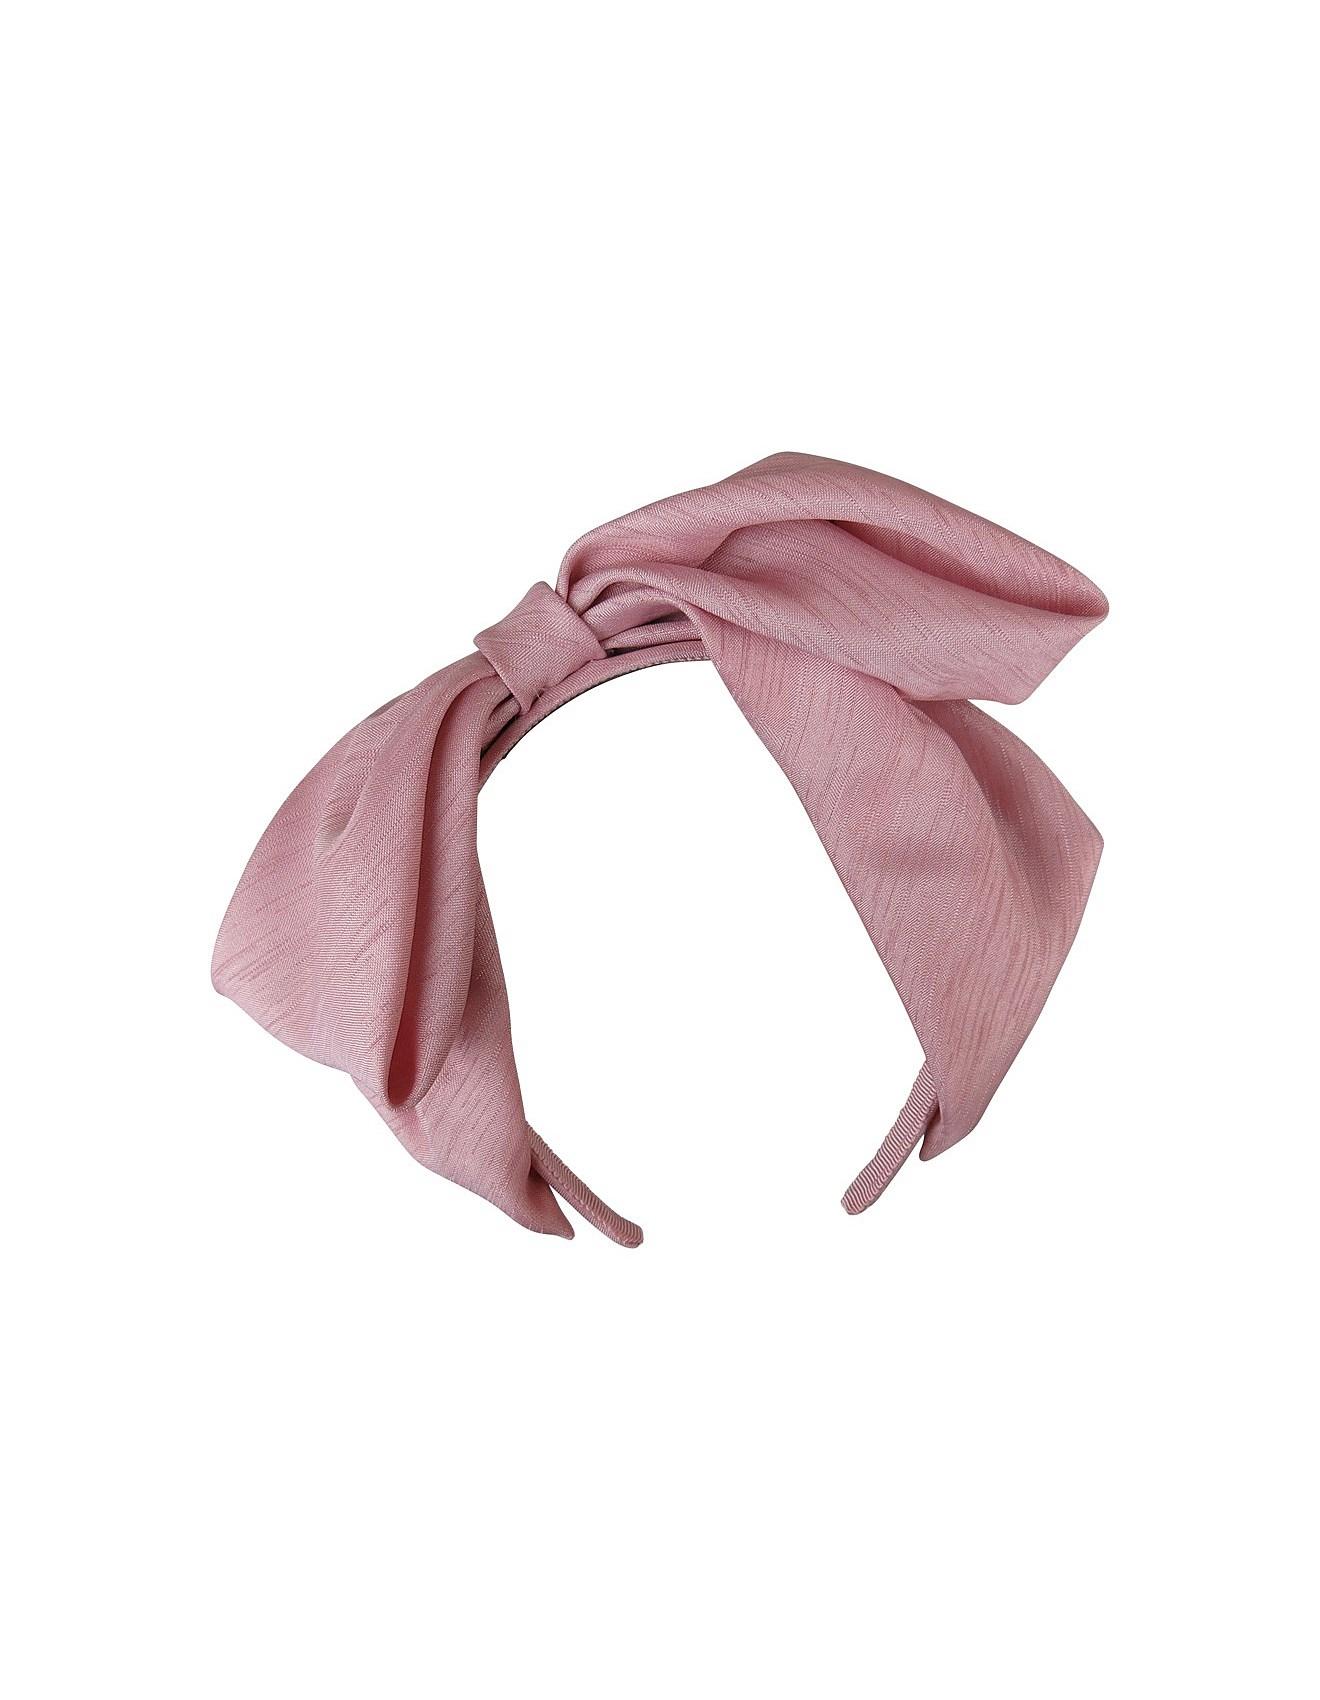 Bags   Accessories - Shantung floppy bow headband f2333c7c2ae